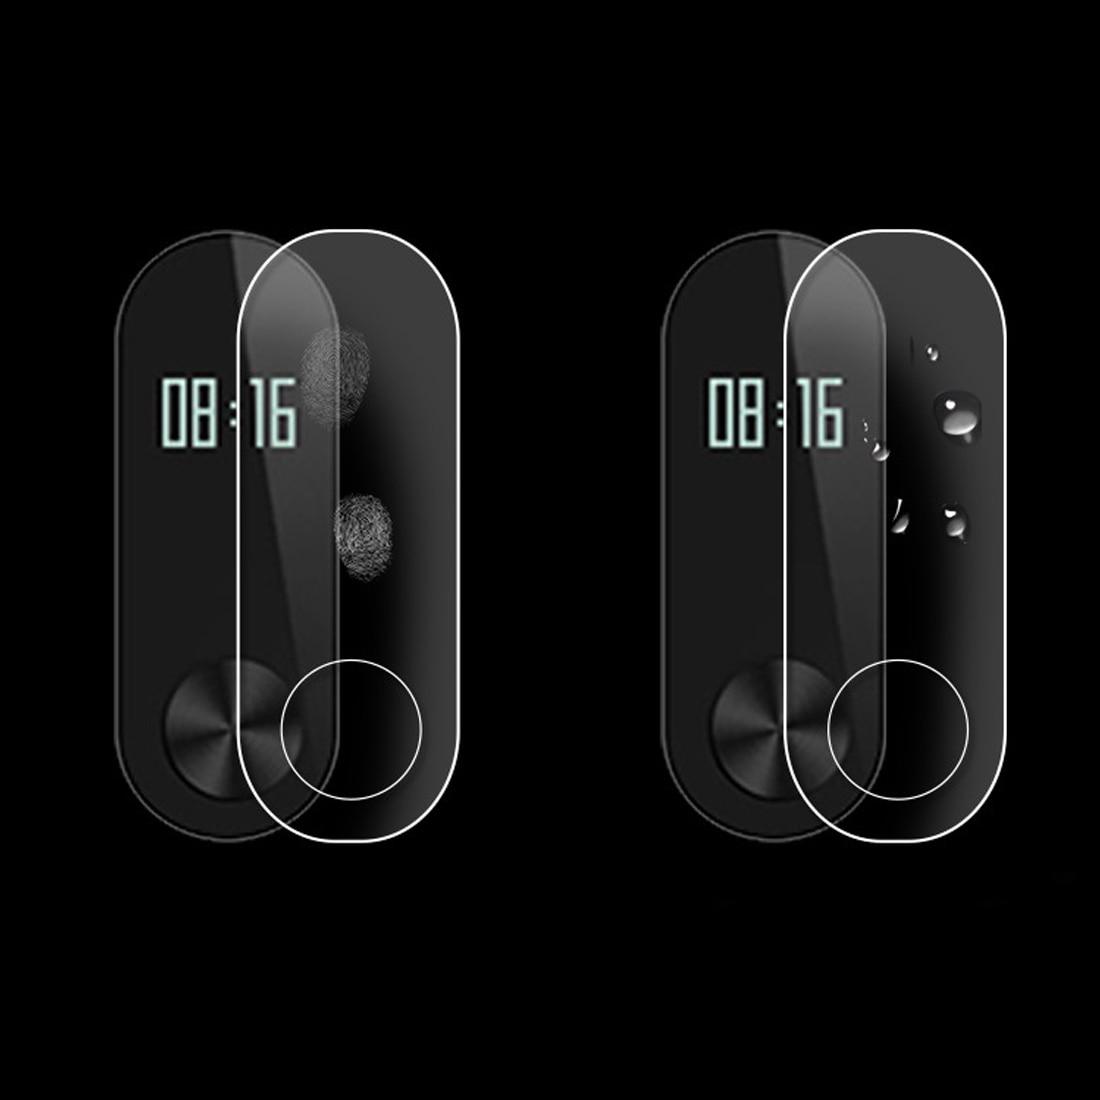 Tragbare Geräte Freundschaftlich 2 Teile/los Centechia Für Xiao Mi Mi Band 2 Band2 Screen Protector Hd Ultra Dünne Anti-scratch Schutz Film Schutz Ausgereifte Technologien